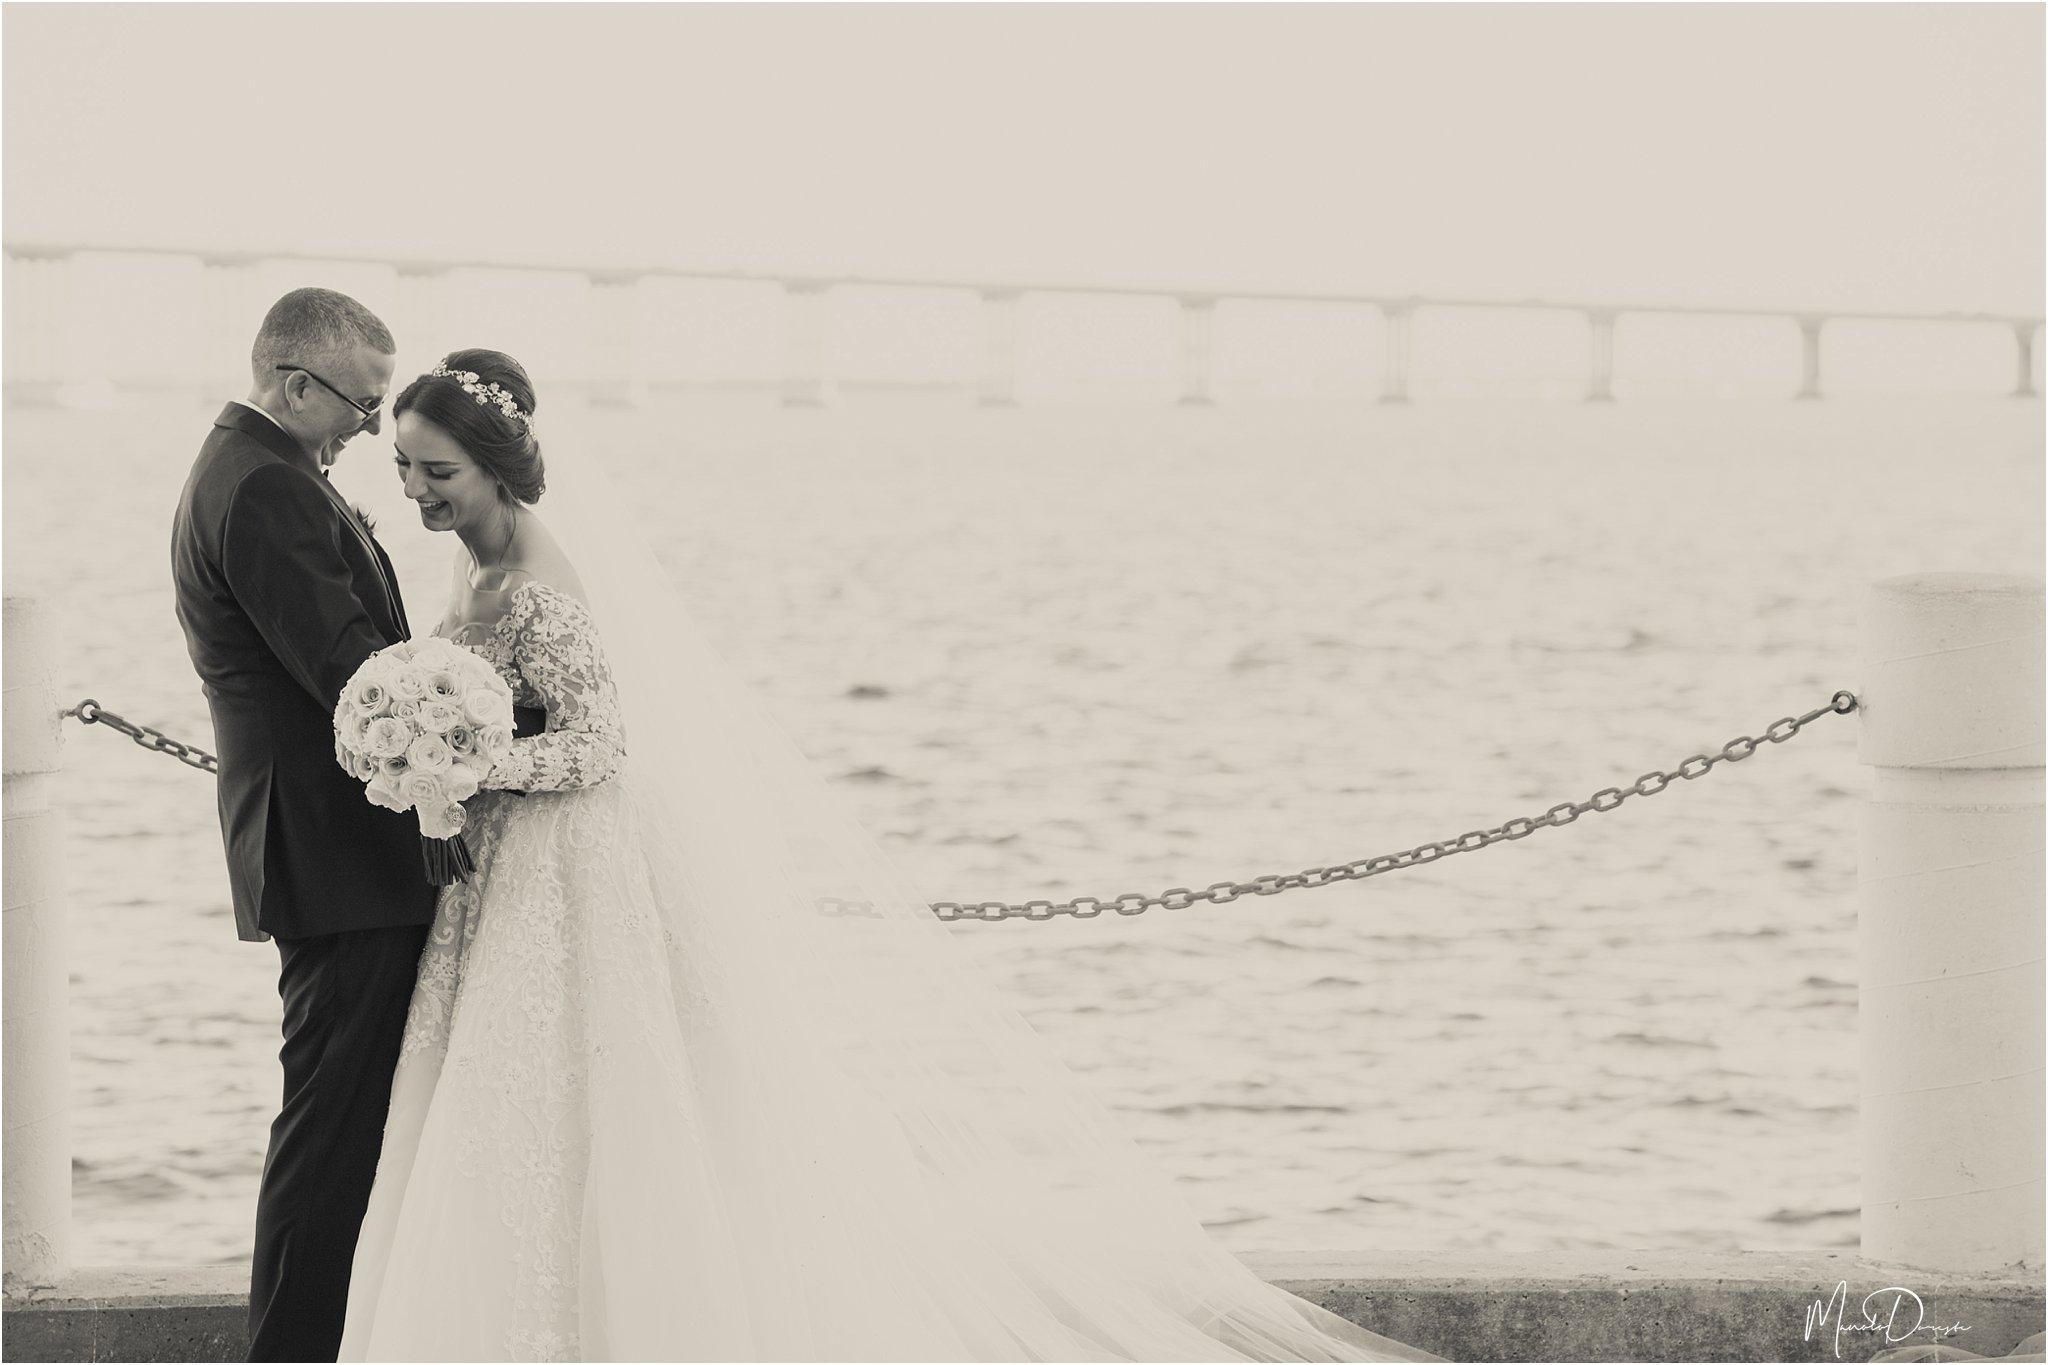 00728_ManoloDoreste_InFocusStudios_Wedding_Family_Photography_Miami_MiamiPhotographer.jpg